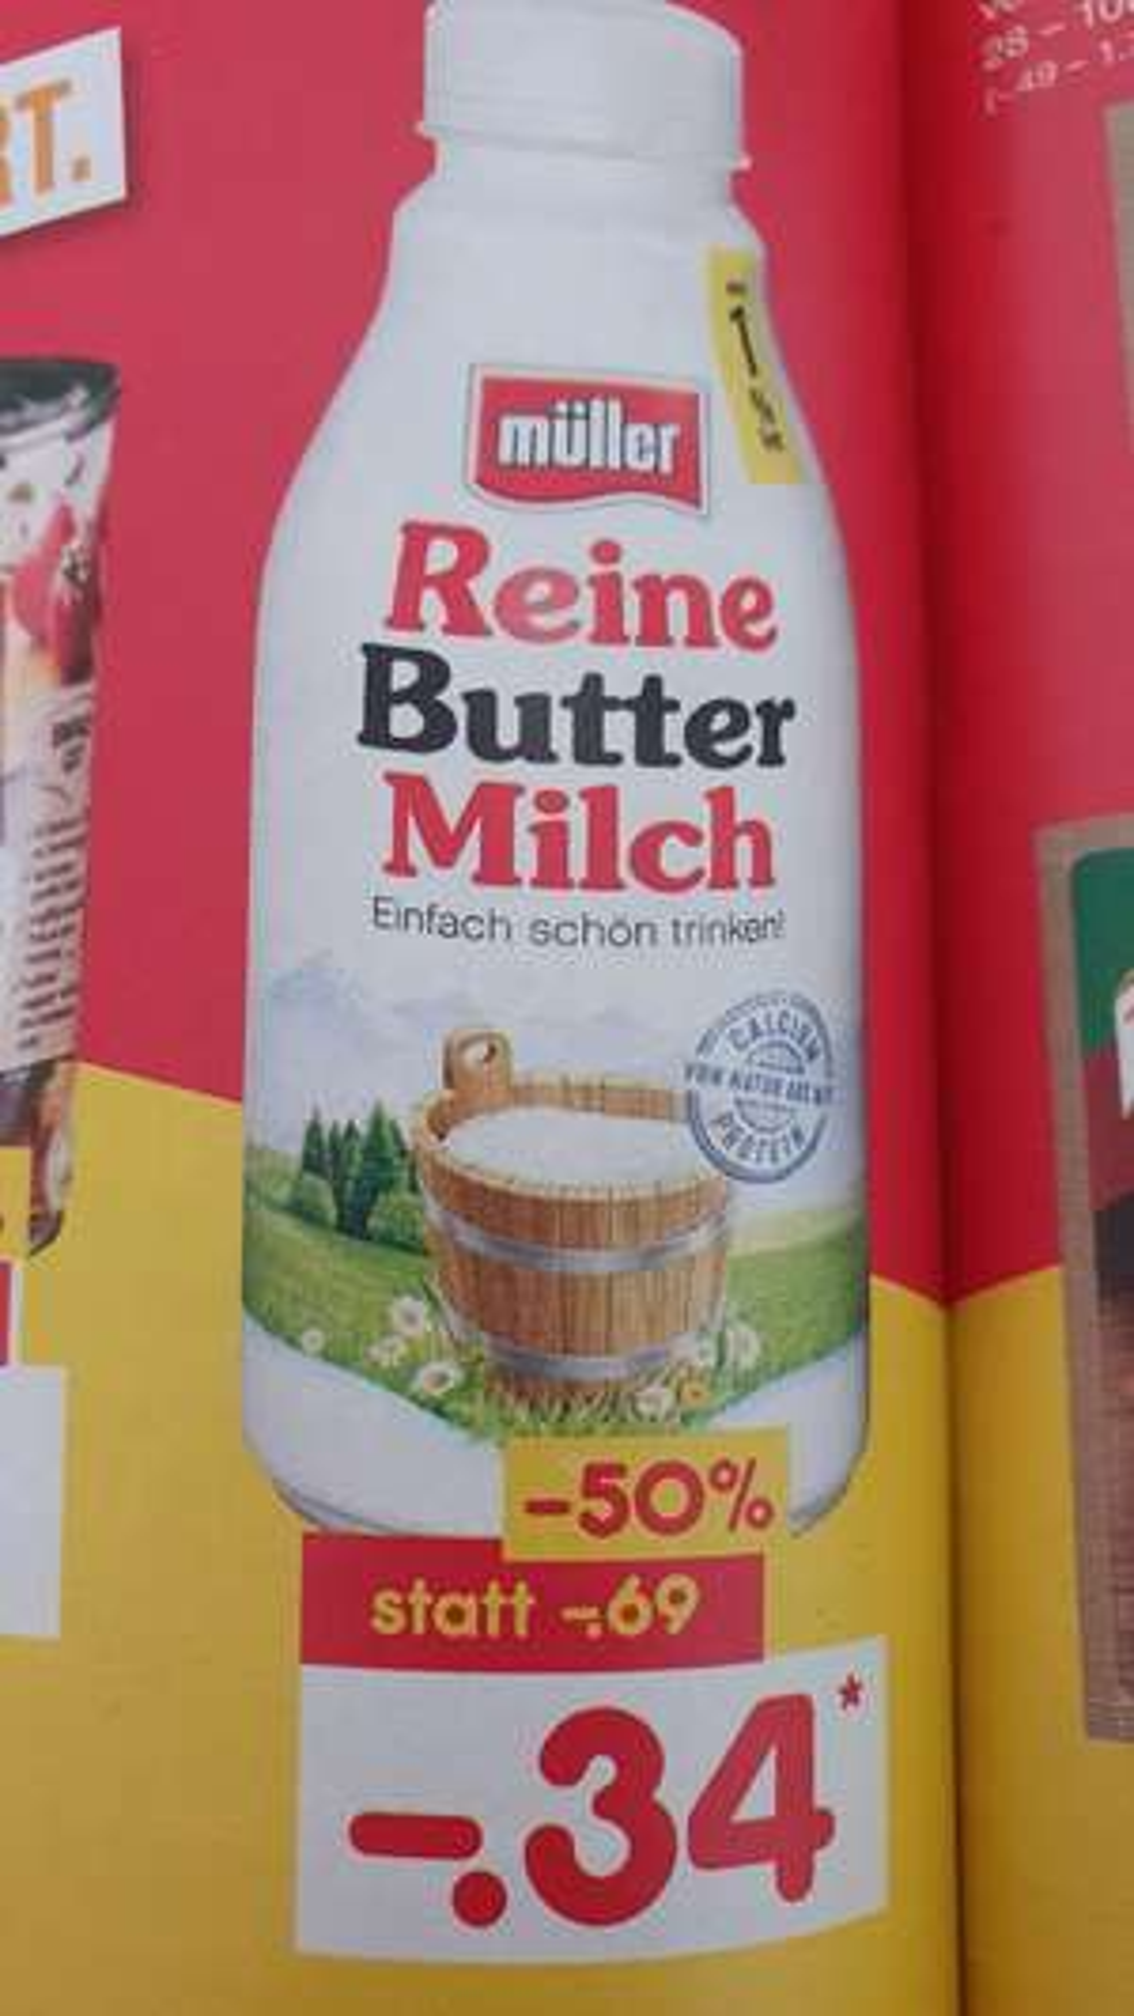 [NETTO MD/ EDEKA Center]  Müller Reine Butter Milch 500g